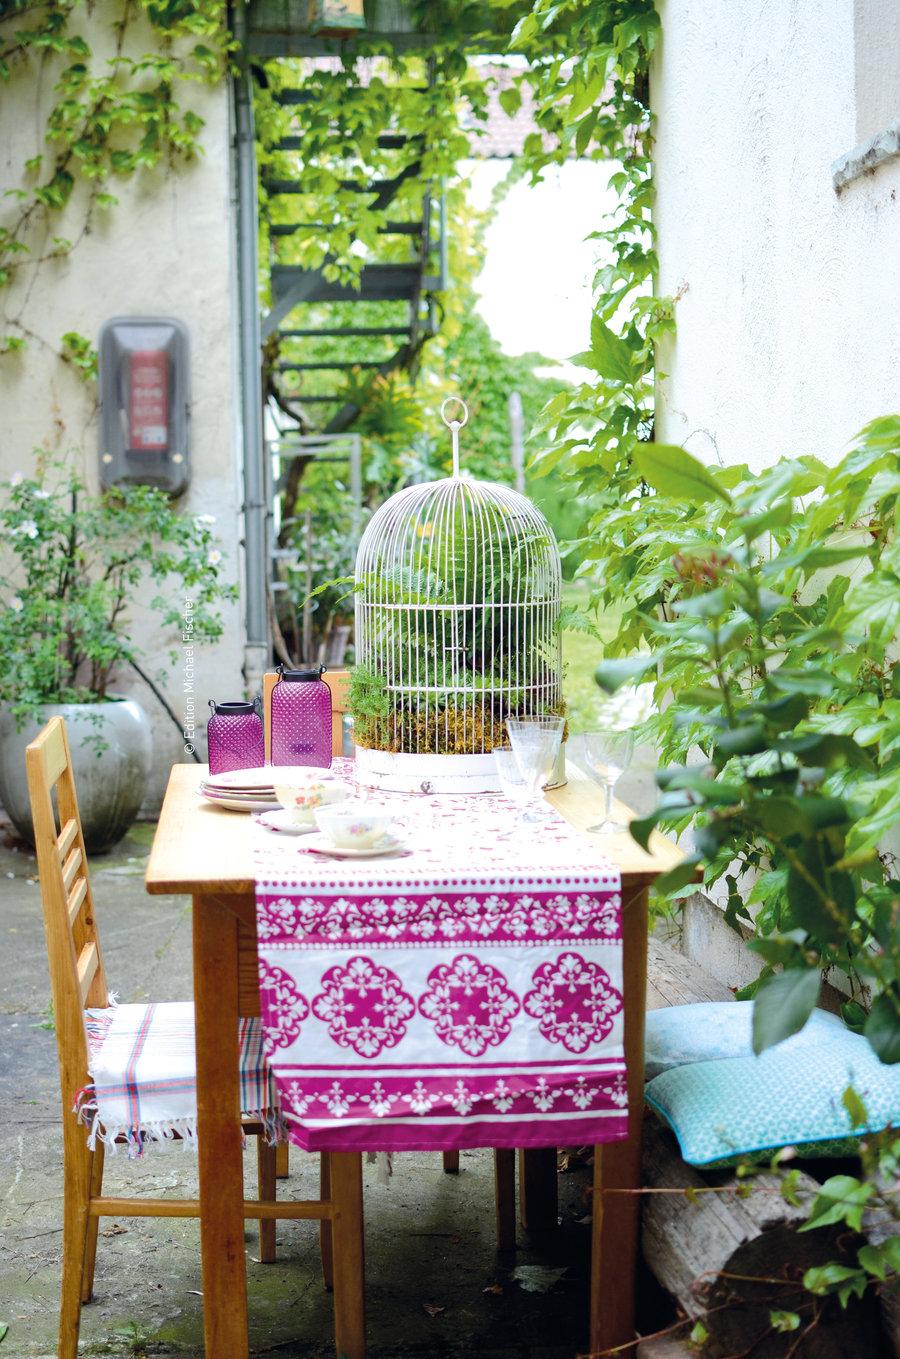 top 3 diy ideen f r balkon und terrasse. Black Bedroom Furniture Sets. Home Design Ideas